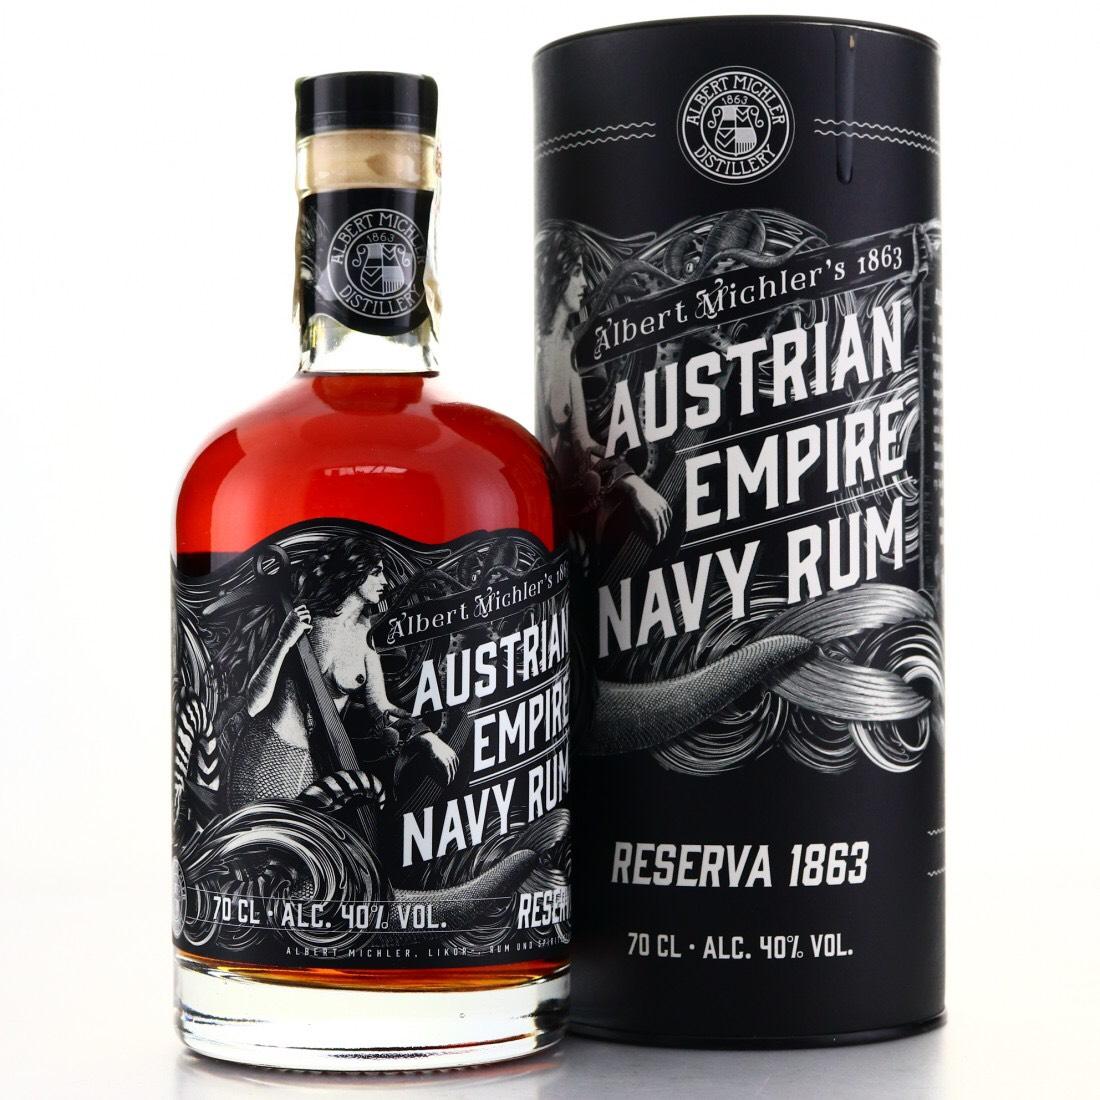 Bottle image of Austrian Empire Navy Rum Reserve 1863